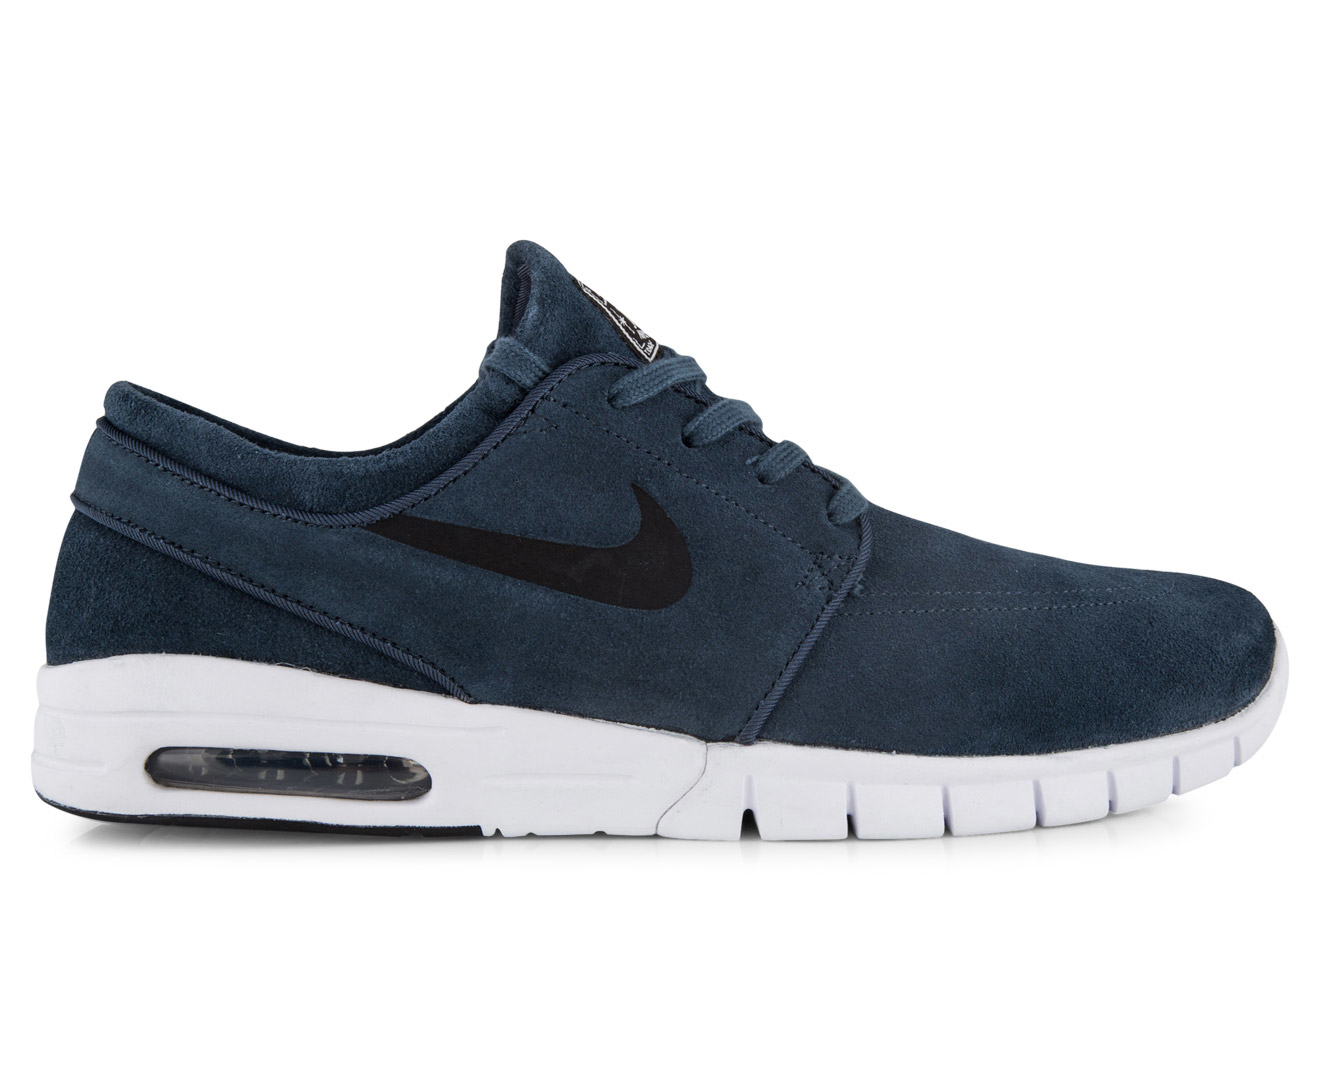 the best attitude d8445 e511c ... Nike Mens Stefan Janoski Max L Shoe - Squadron BlueBlackWhite Great  daily deals at Australias favourite ...